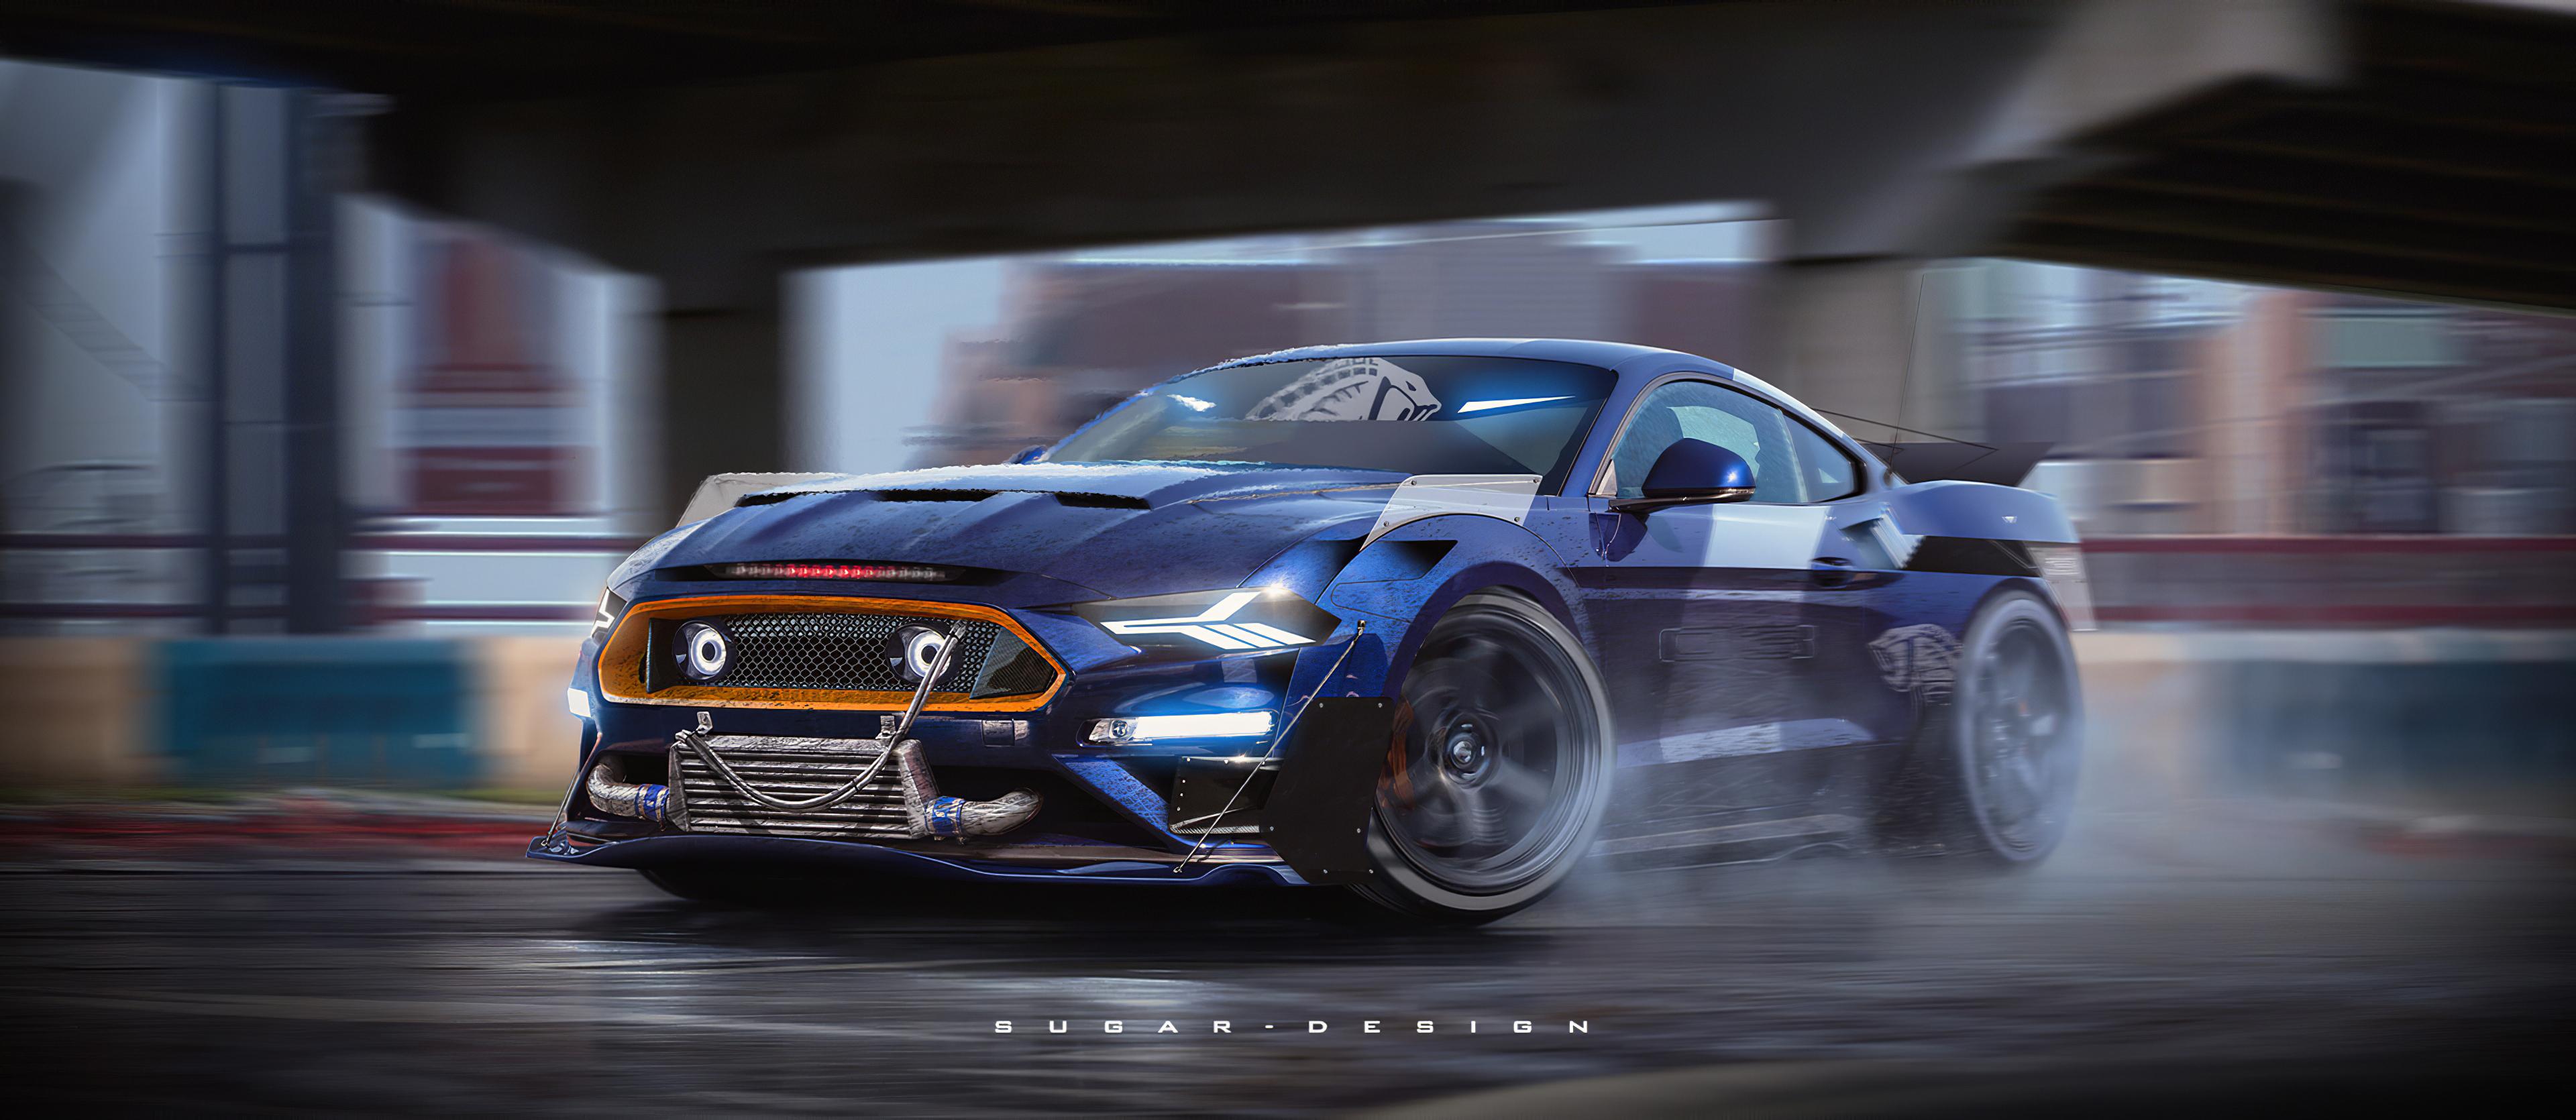 Wallpaper Racing Street Racing Cool Cars